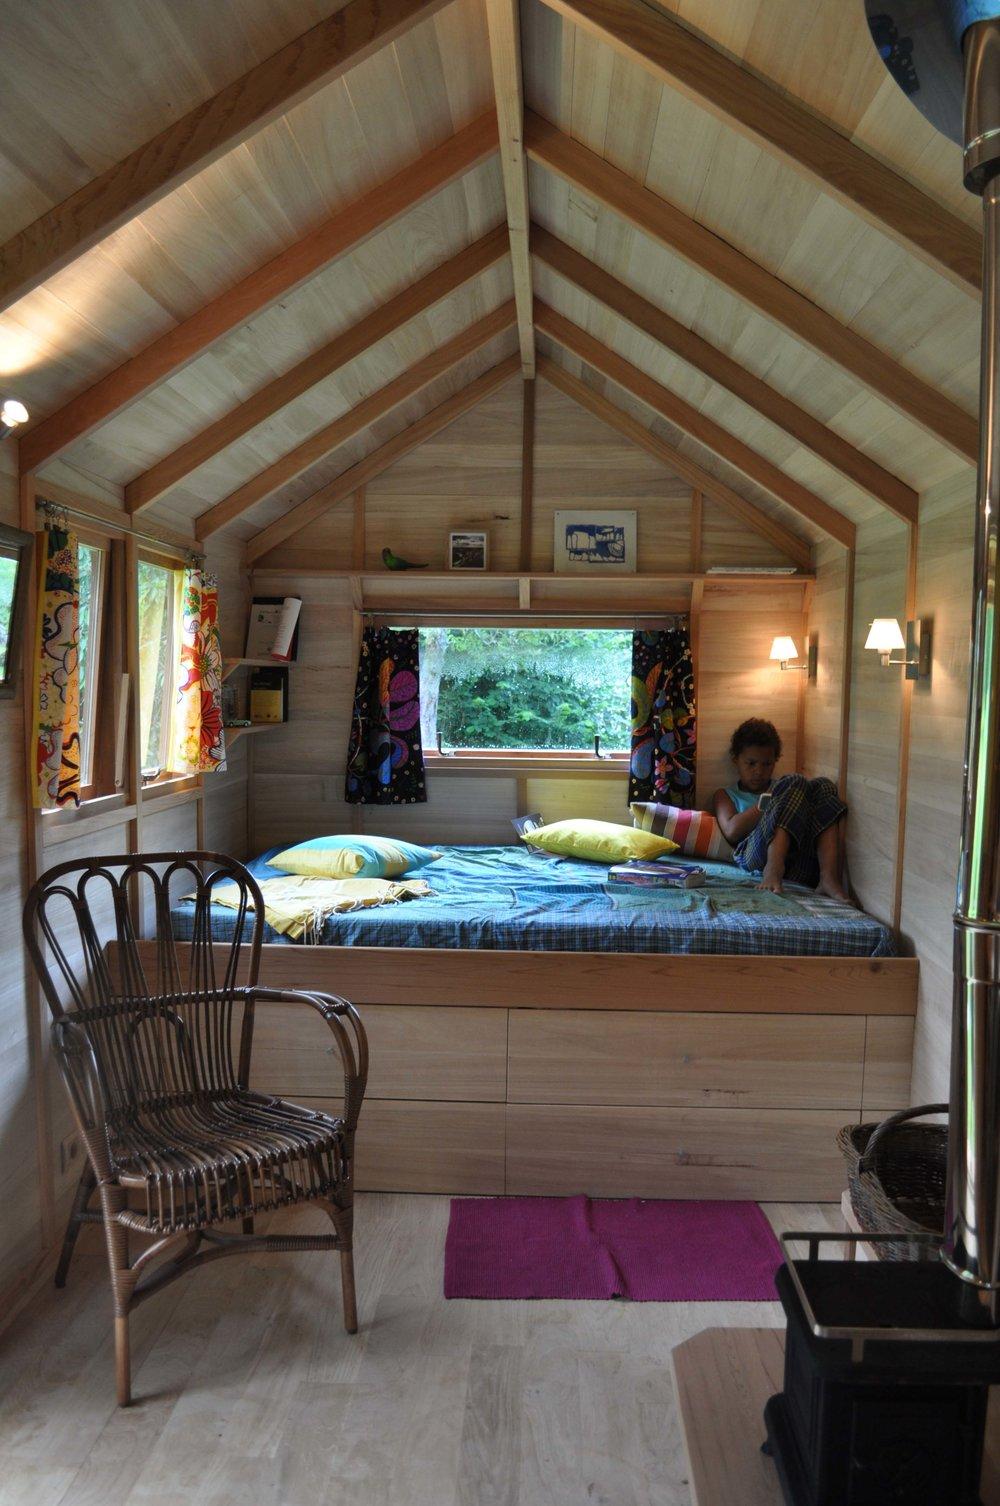 01-11-bureau-histoires-de-cabanes (2).jpg